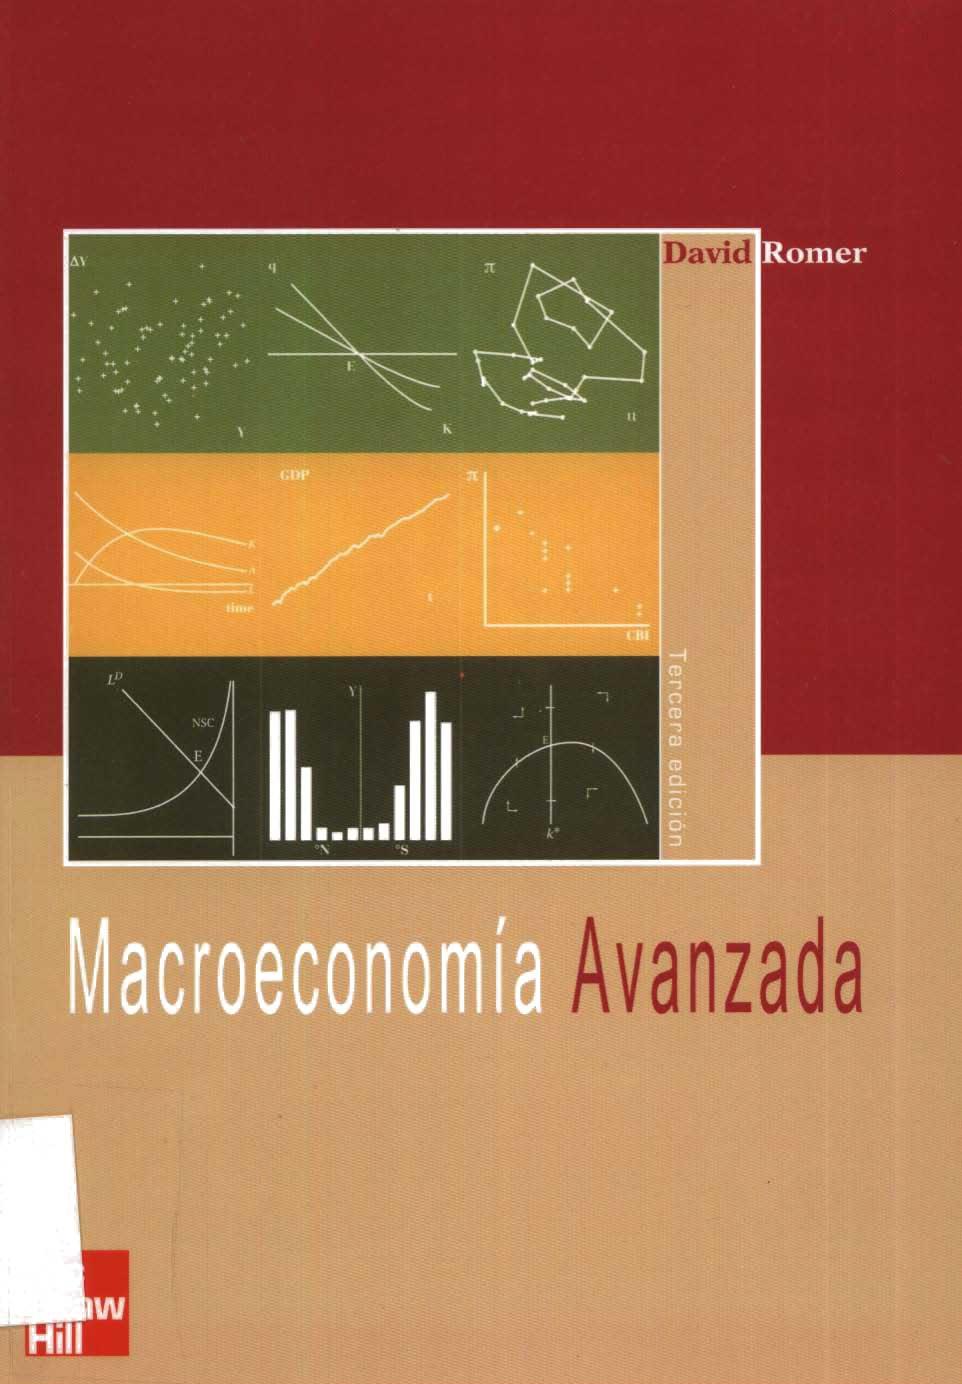 Macroeconoma avanzada de david romer economa digital macroeconoma avanzada de david romer fandeluxe Images